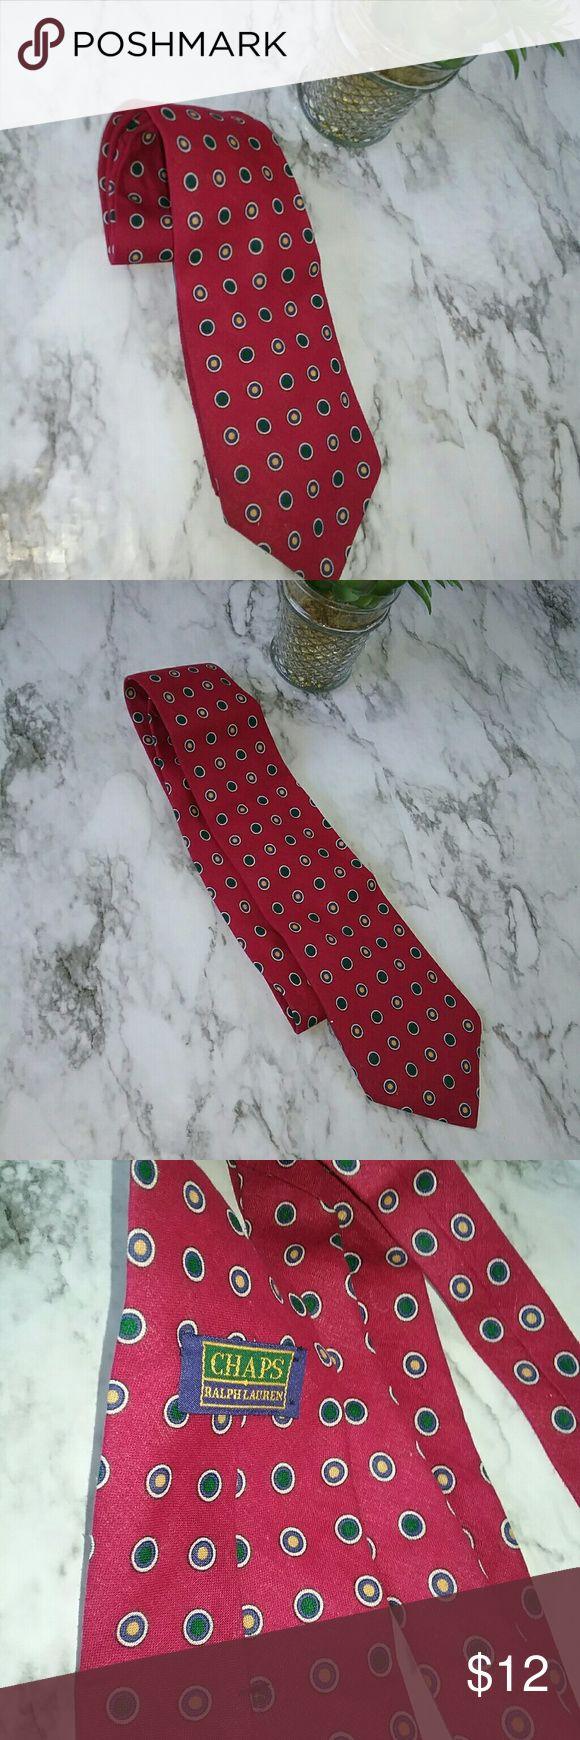 CHAPS RALPH LAUREN MENS RED POLKA DOT TIE This is a chaps Ralph Lauren red polka dot tie. It is a lightweight cotton fabric. It is in great pre-owned condition. Chaps Ralph Lauren Accessories Ties